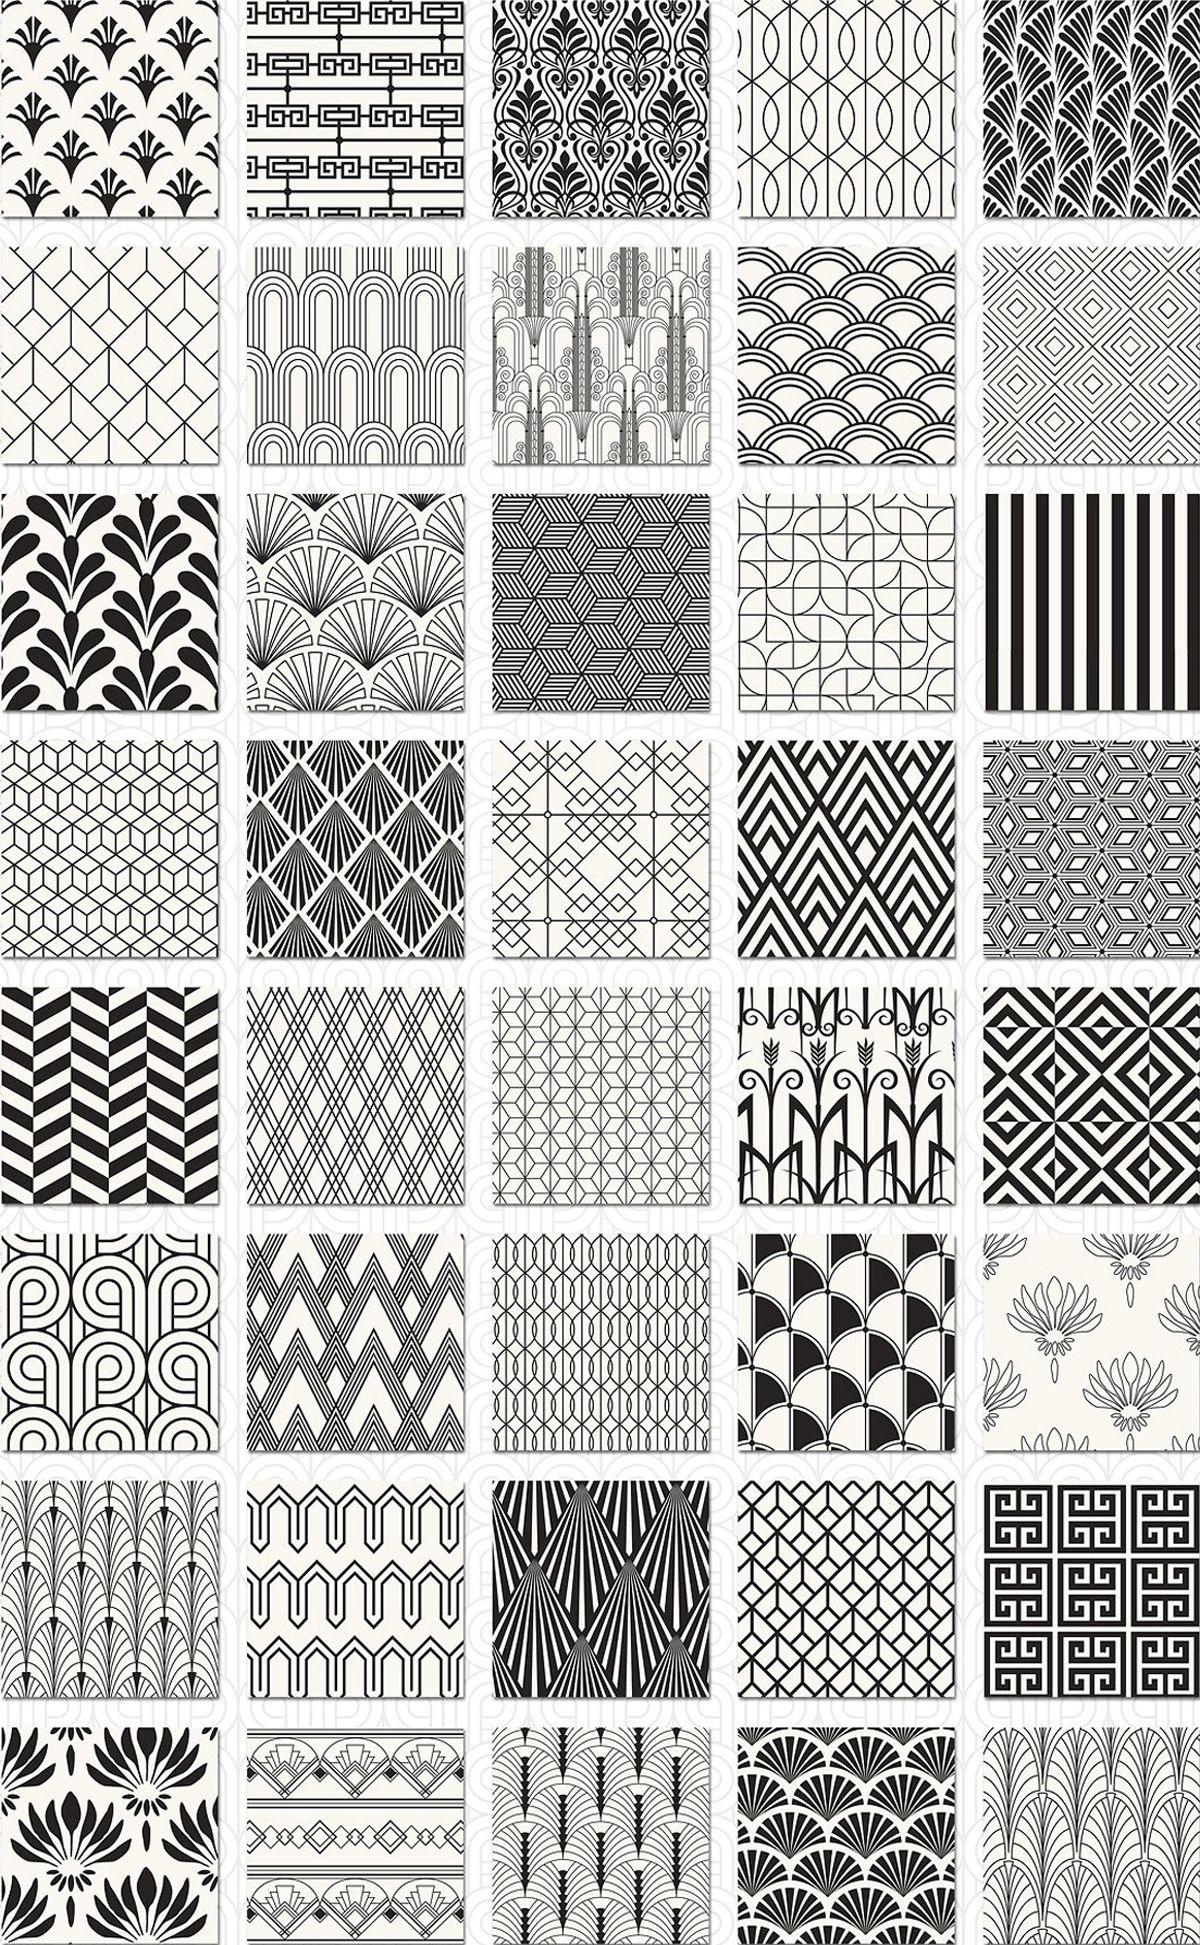 1920s Patterns · KapfenbergGemalte OrnamenteVerzierungDrechselbankHaus  RenovierungenLogo IdeenBlume ...